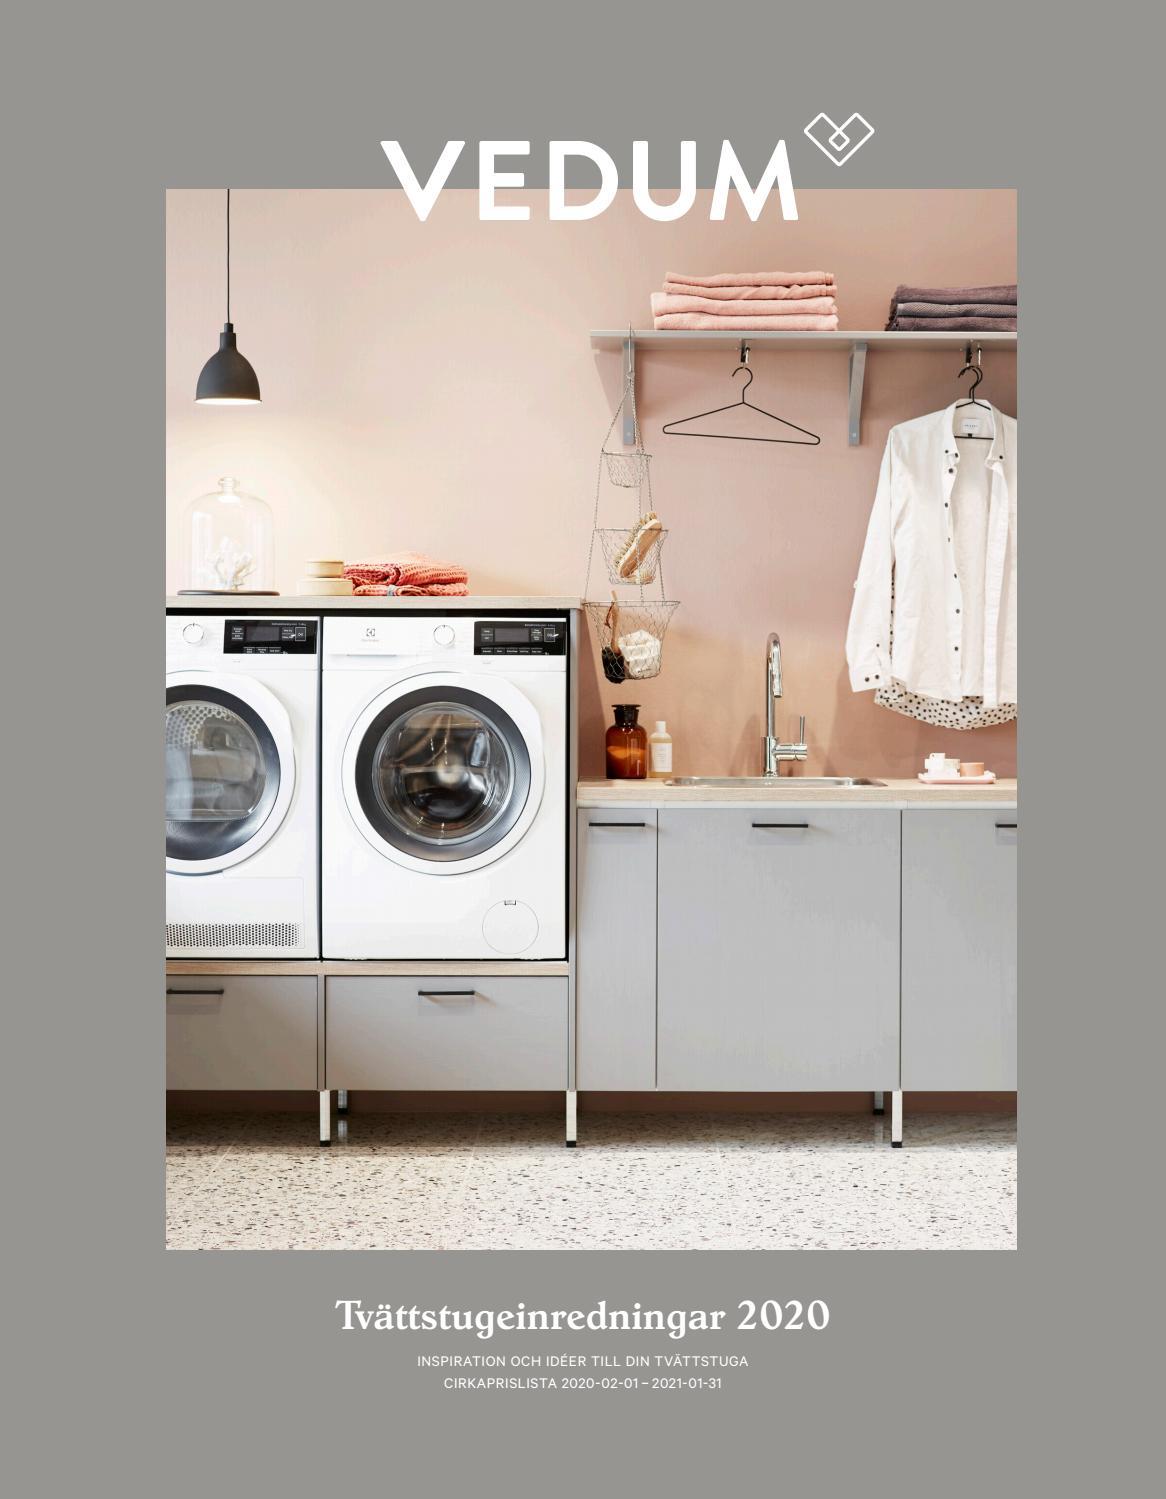 Nyinflyttade p Vedum svartagrden 5, Vedum | satisfaction-survey.net